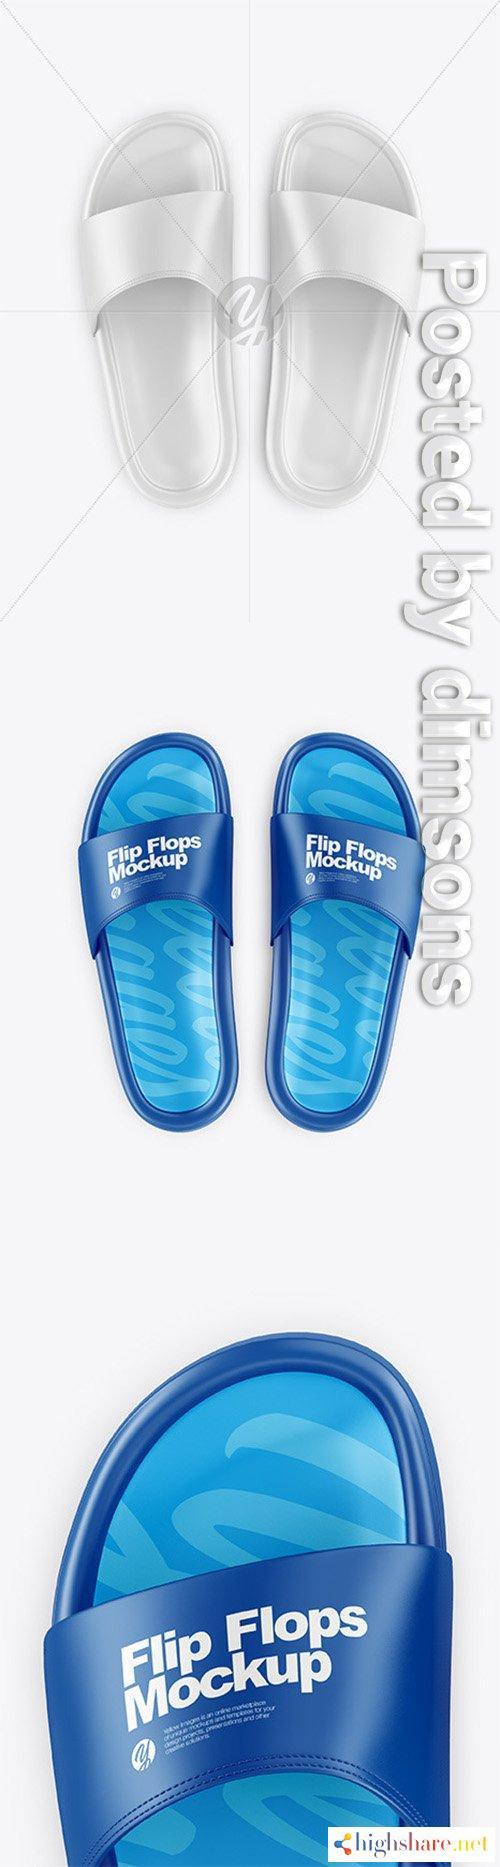 flip flops mockup top view 64459 5f40b7875d35c - Flip Flops Mockup - Top View 64459